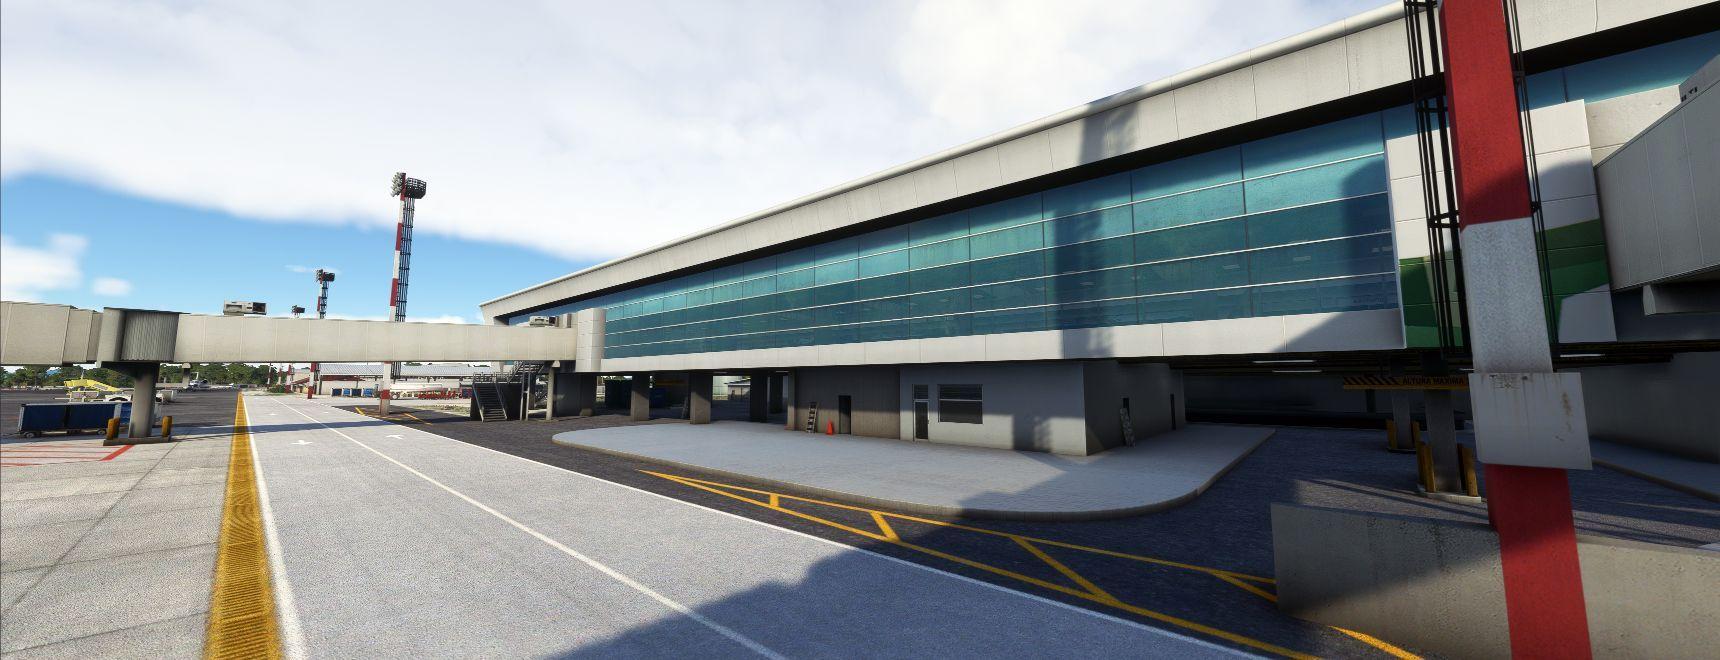 MSFS MRLB Liberia International Airport